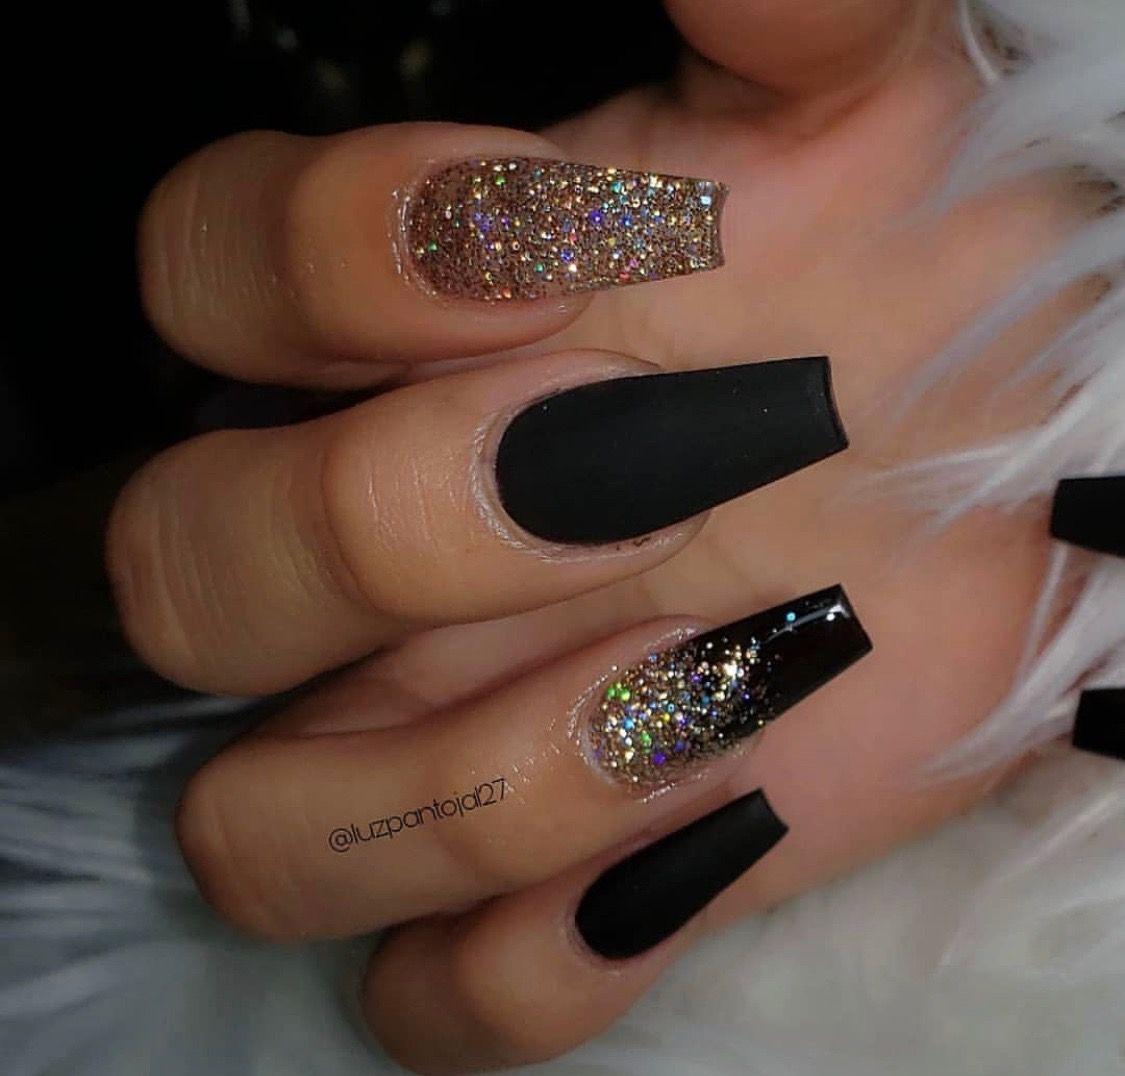 Pin By Teesa Thomas On Love My Nails Ombre Nails Glitter Ombre Nail Designs Black Acrylic Nails